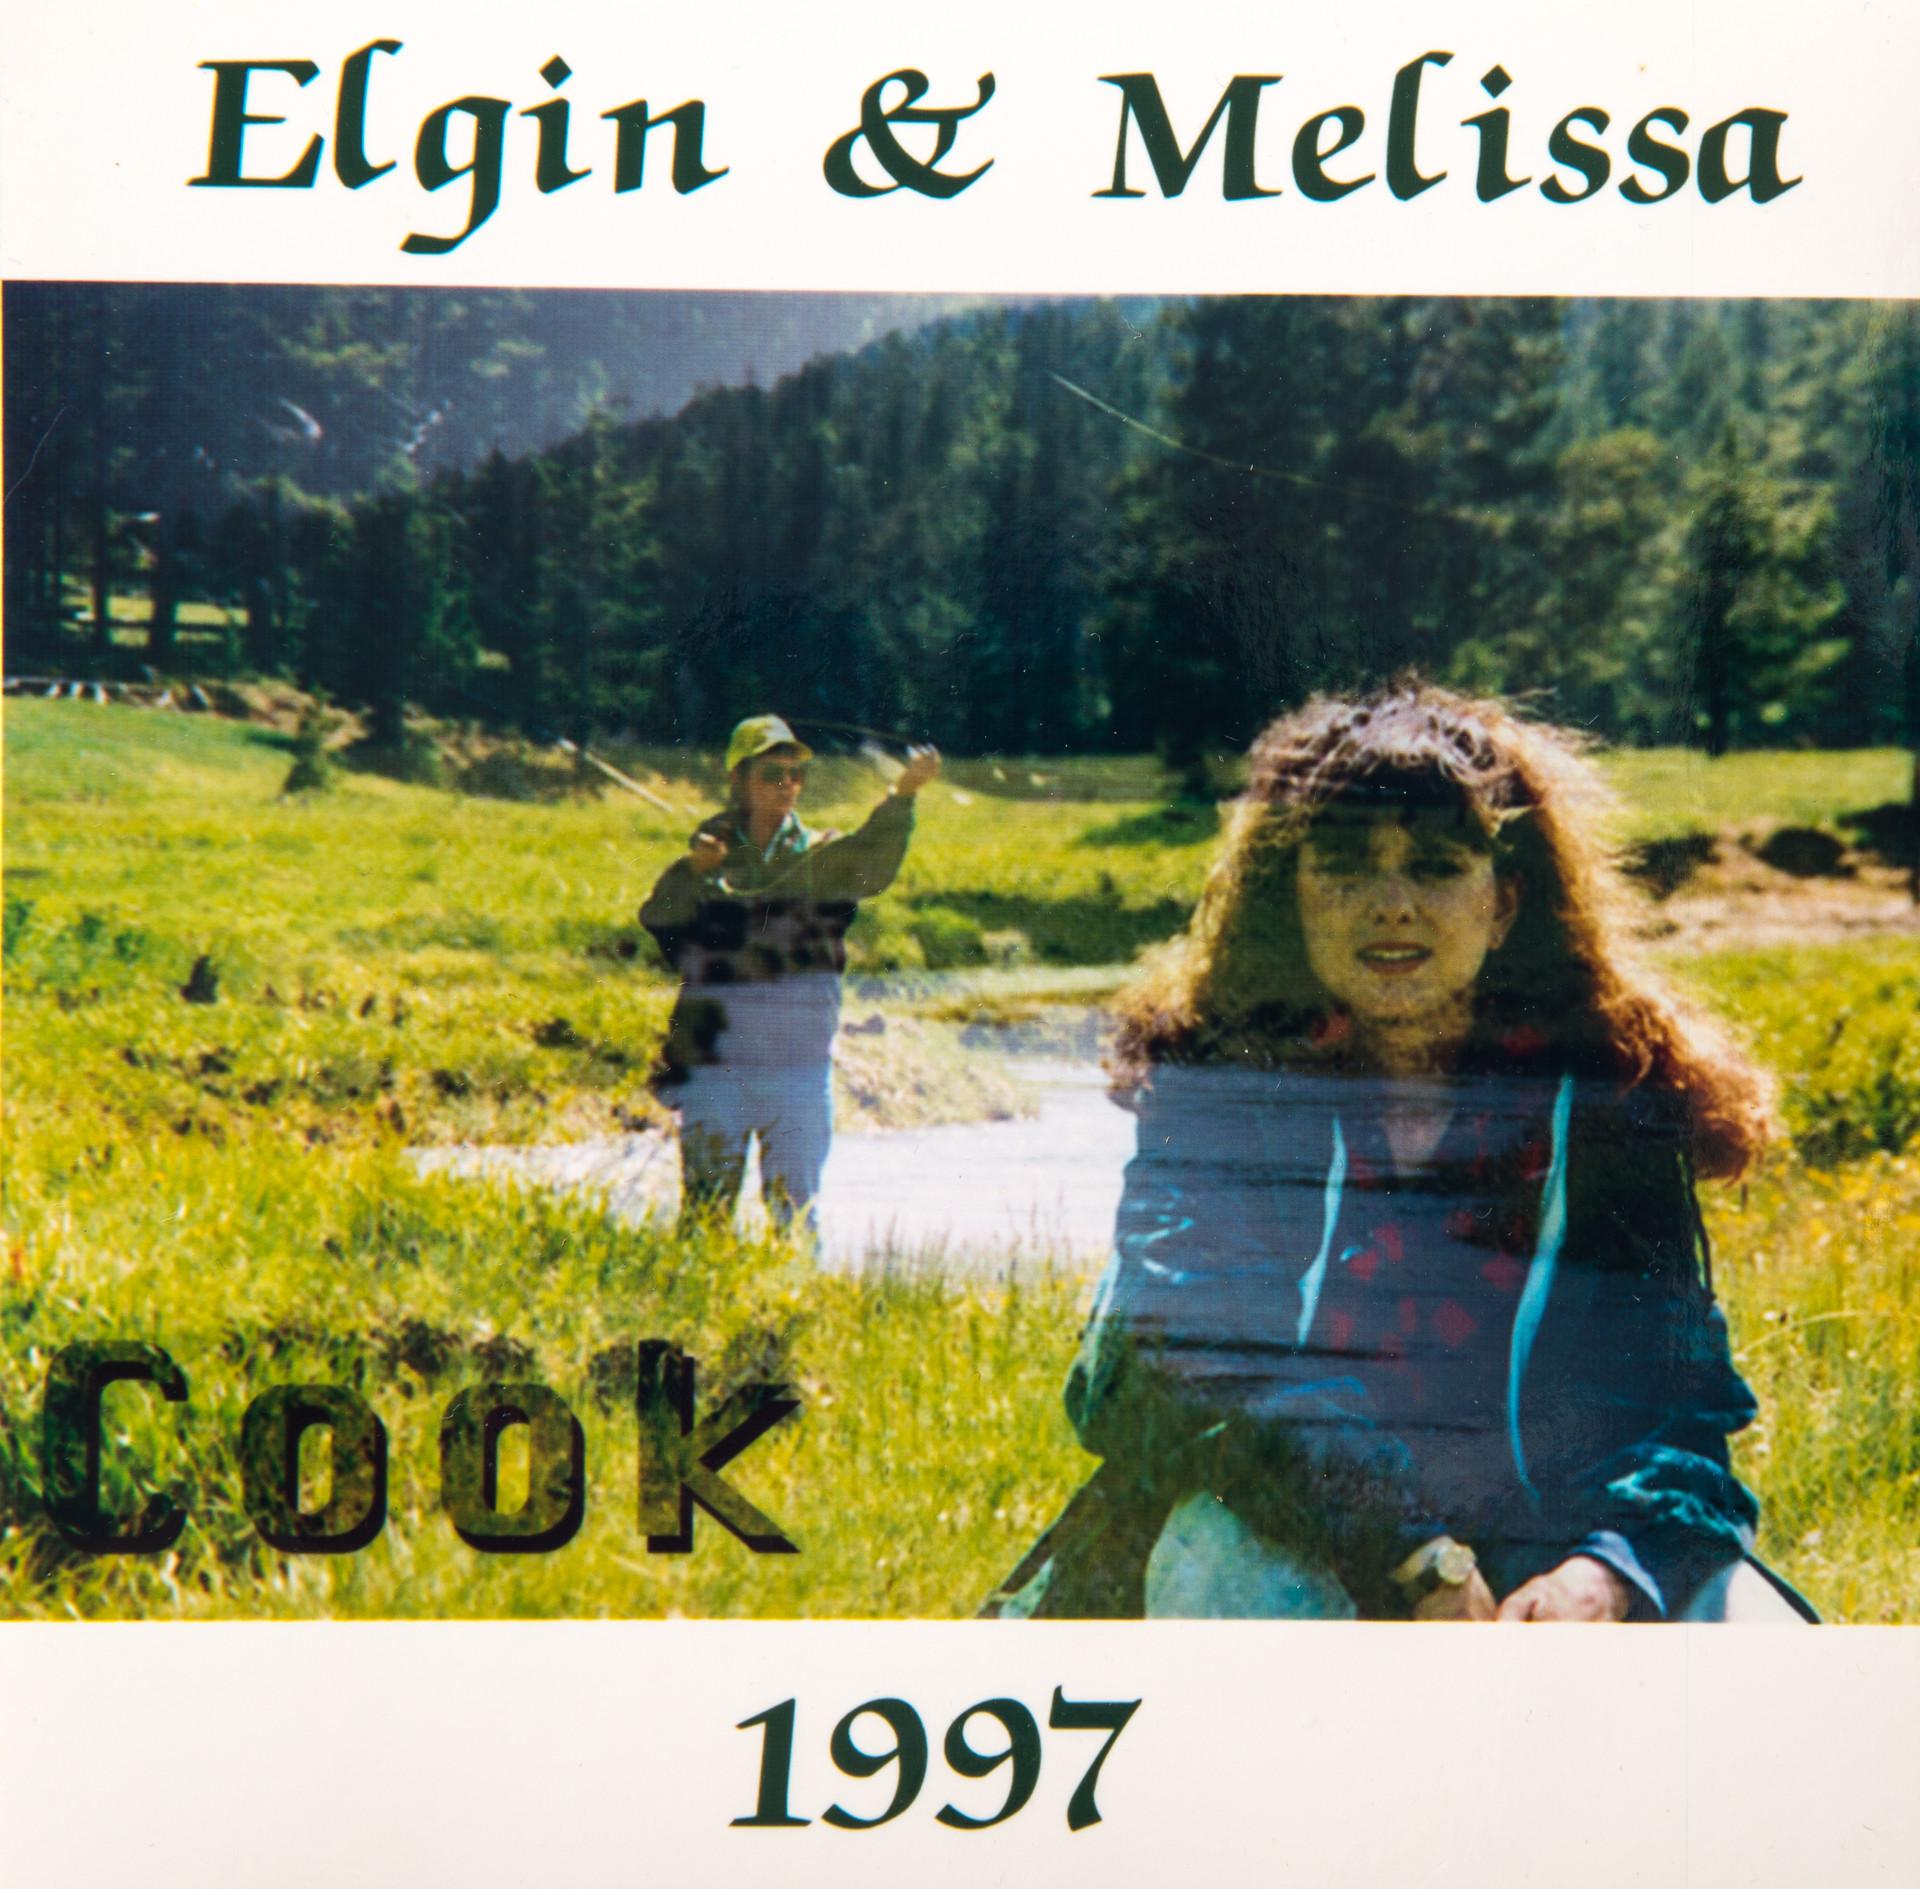 Elgin & Melissa Cook CD Front Cover for Job Application